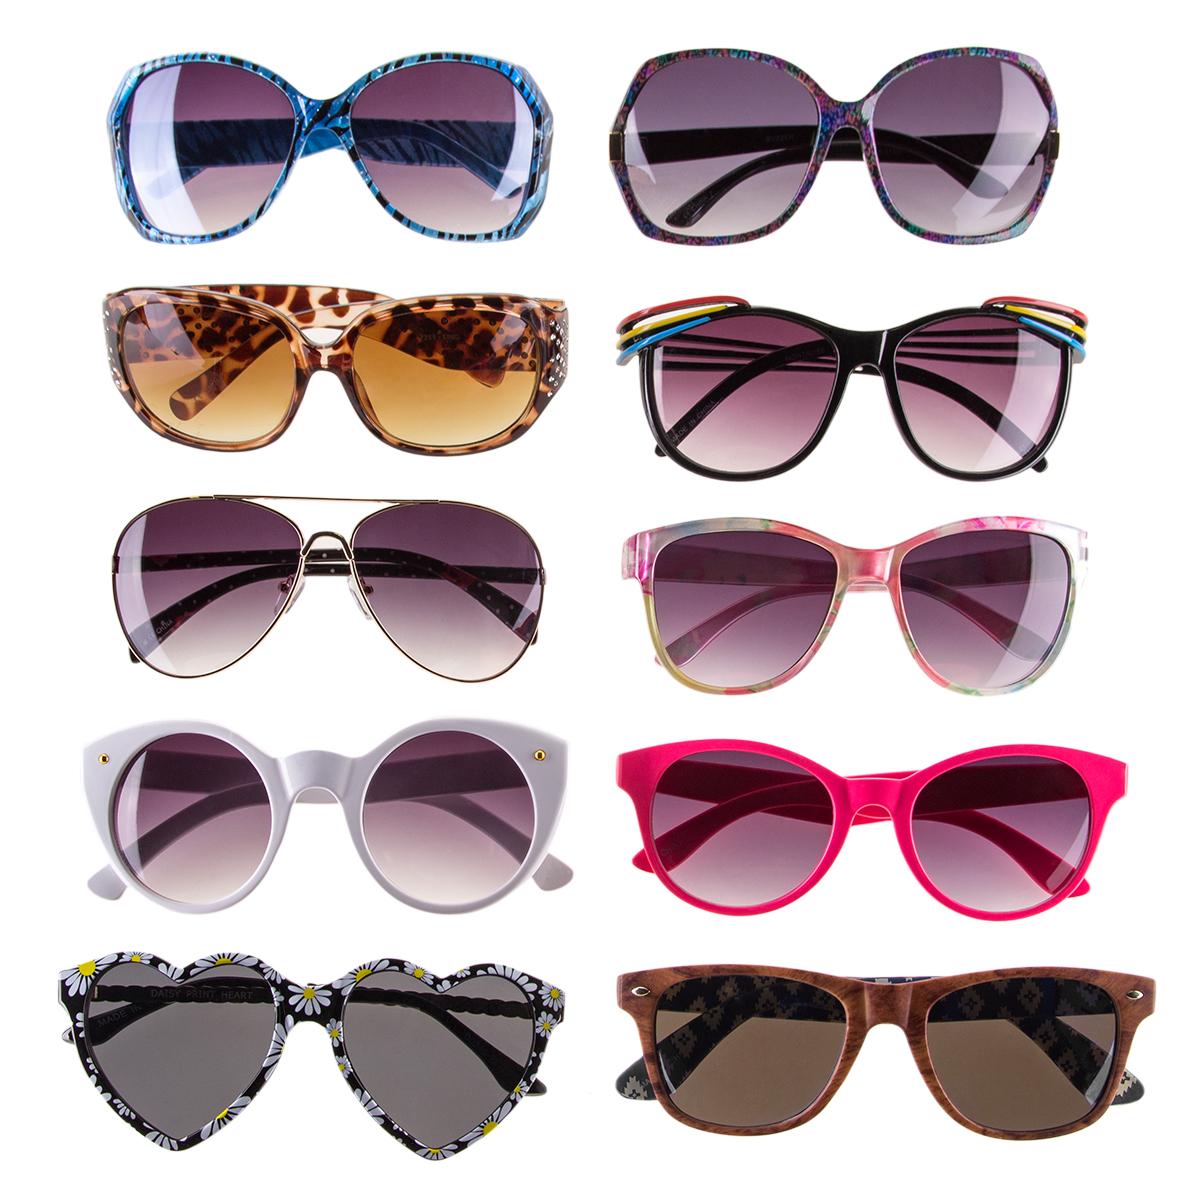 Lot of 6 Pairs Random Pick DG Sunglasses Fashion Designer Shades Combo Set